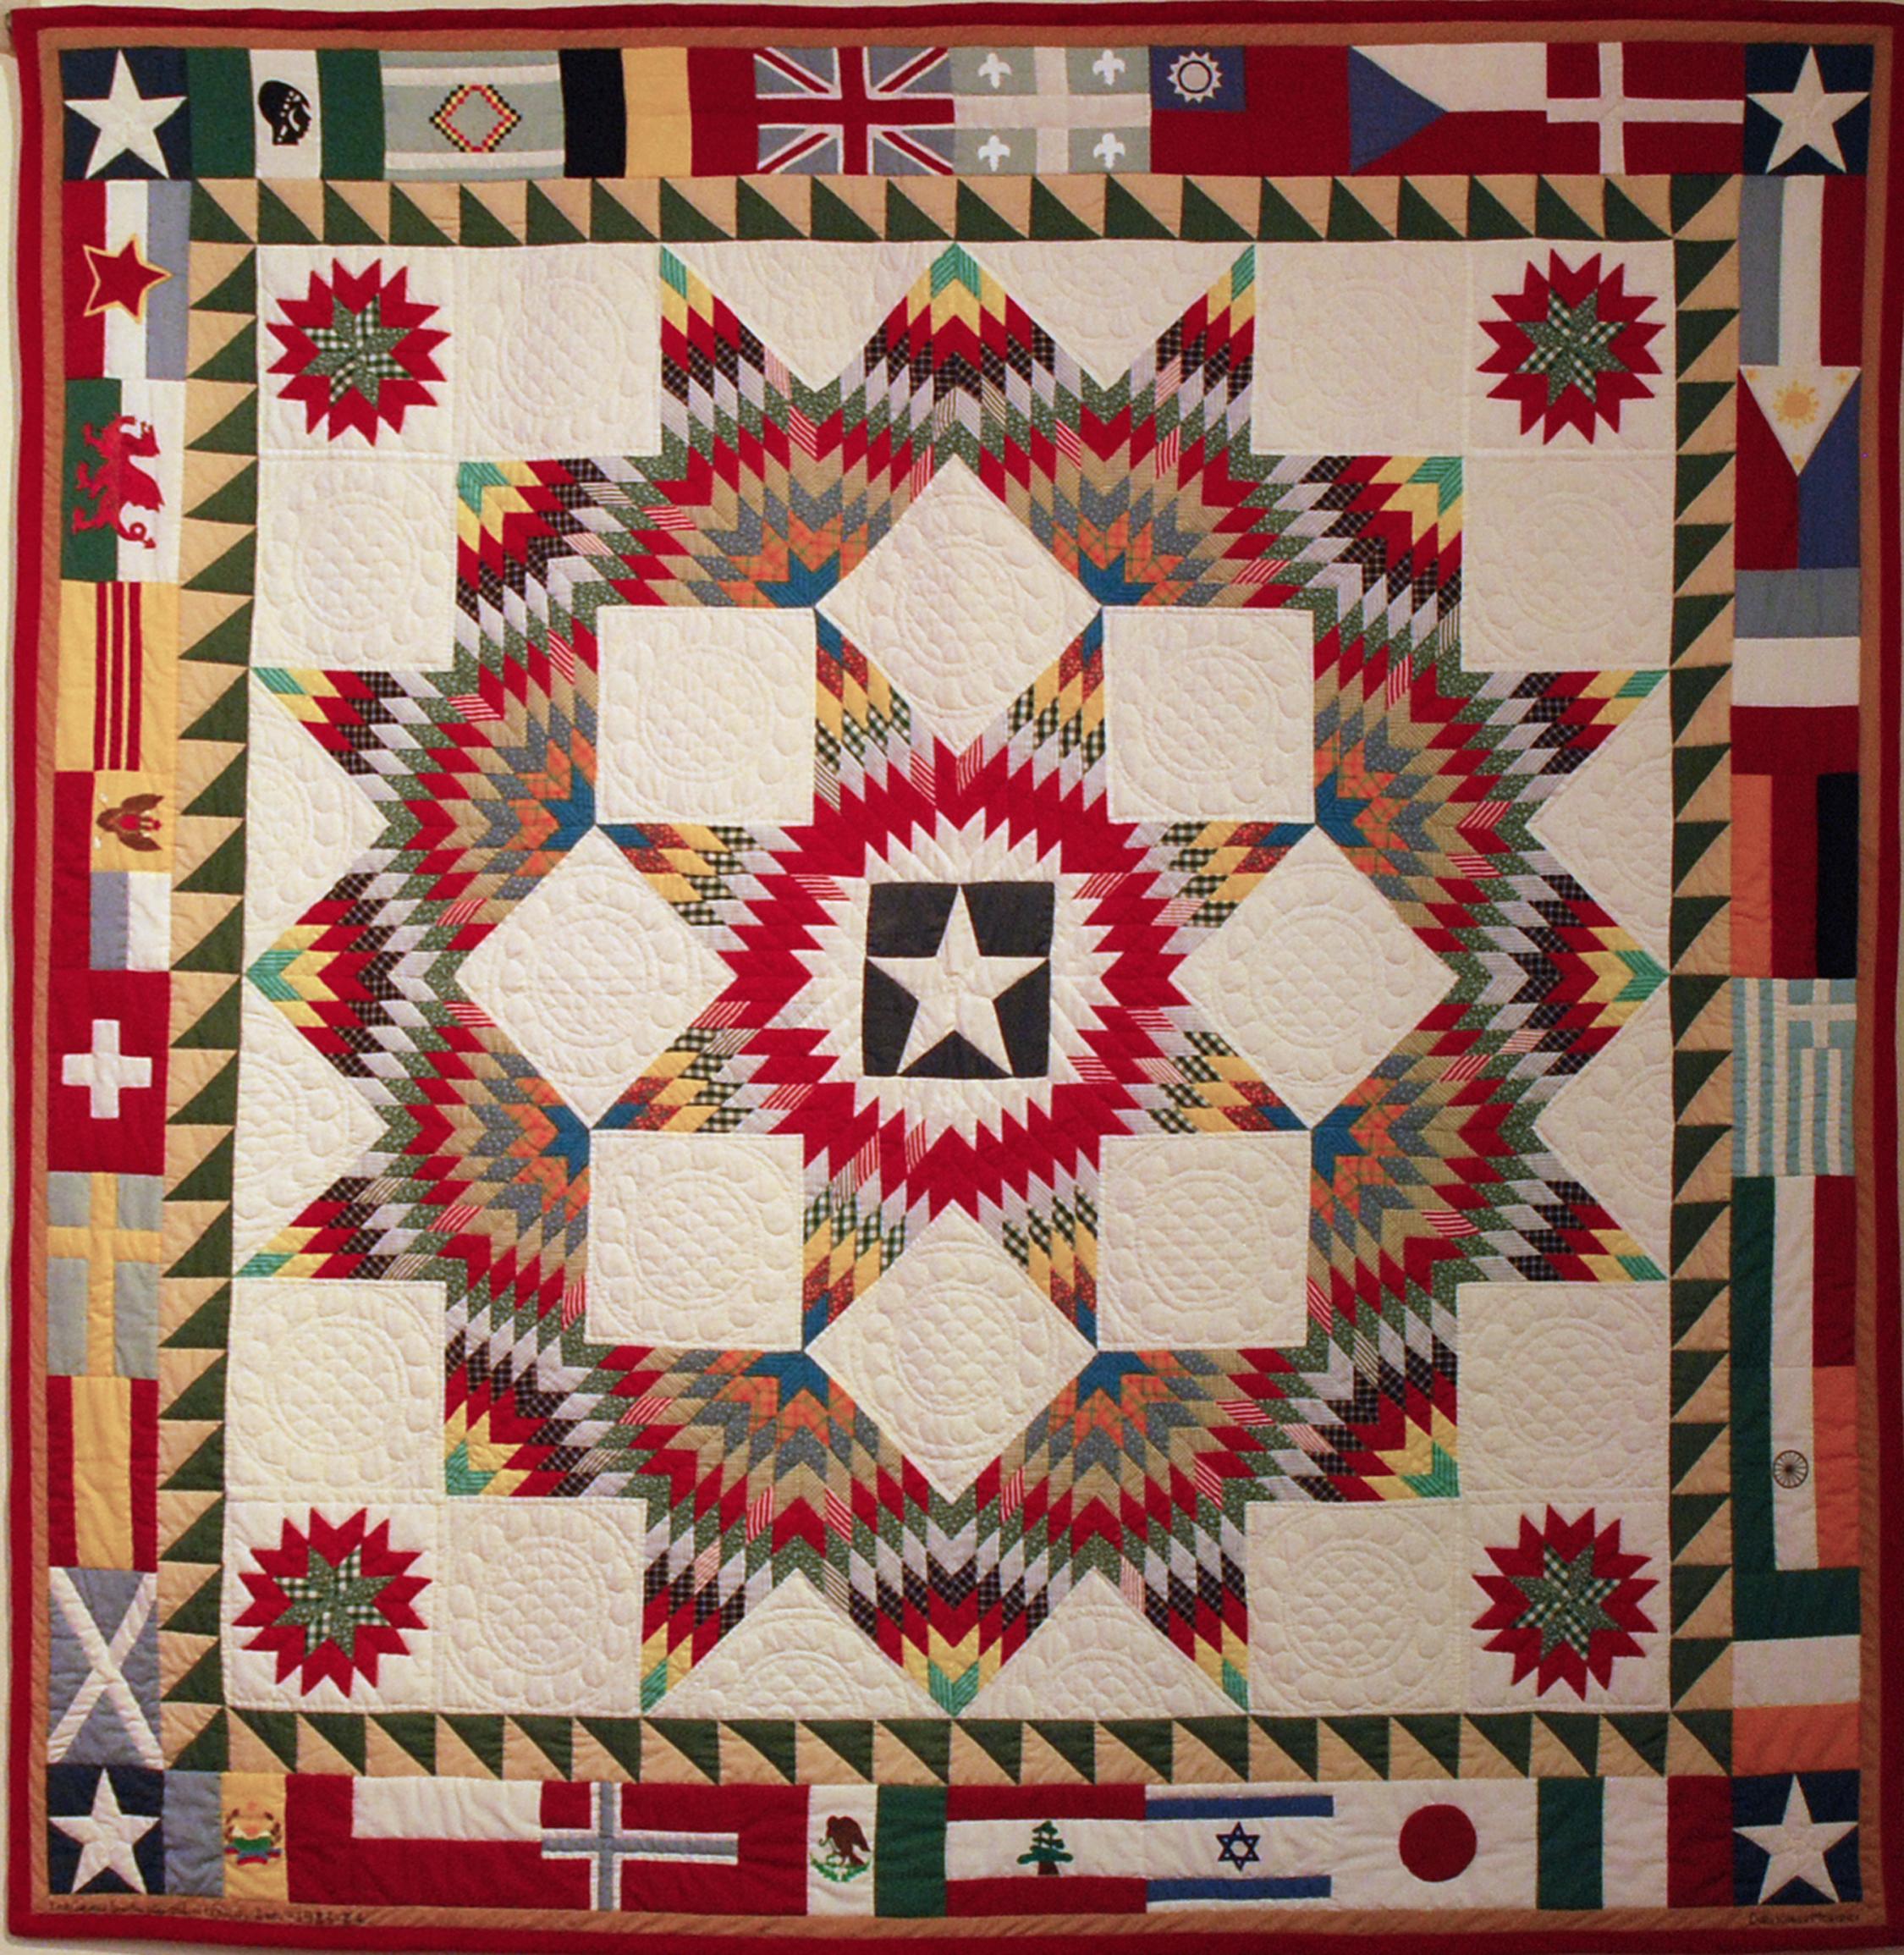 Object: Quilt (1984 Texas Folklife Festival Quilt) | UTSA Institute Of Texan Cultures